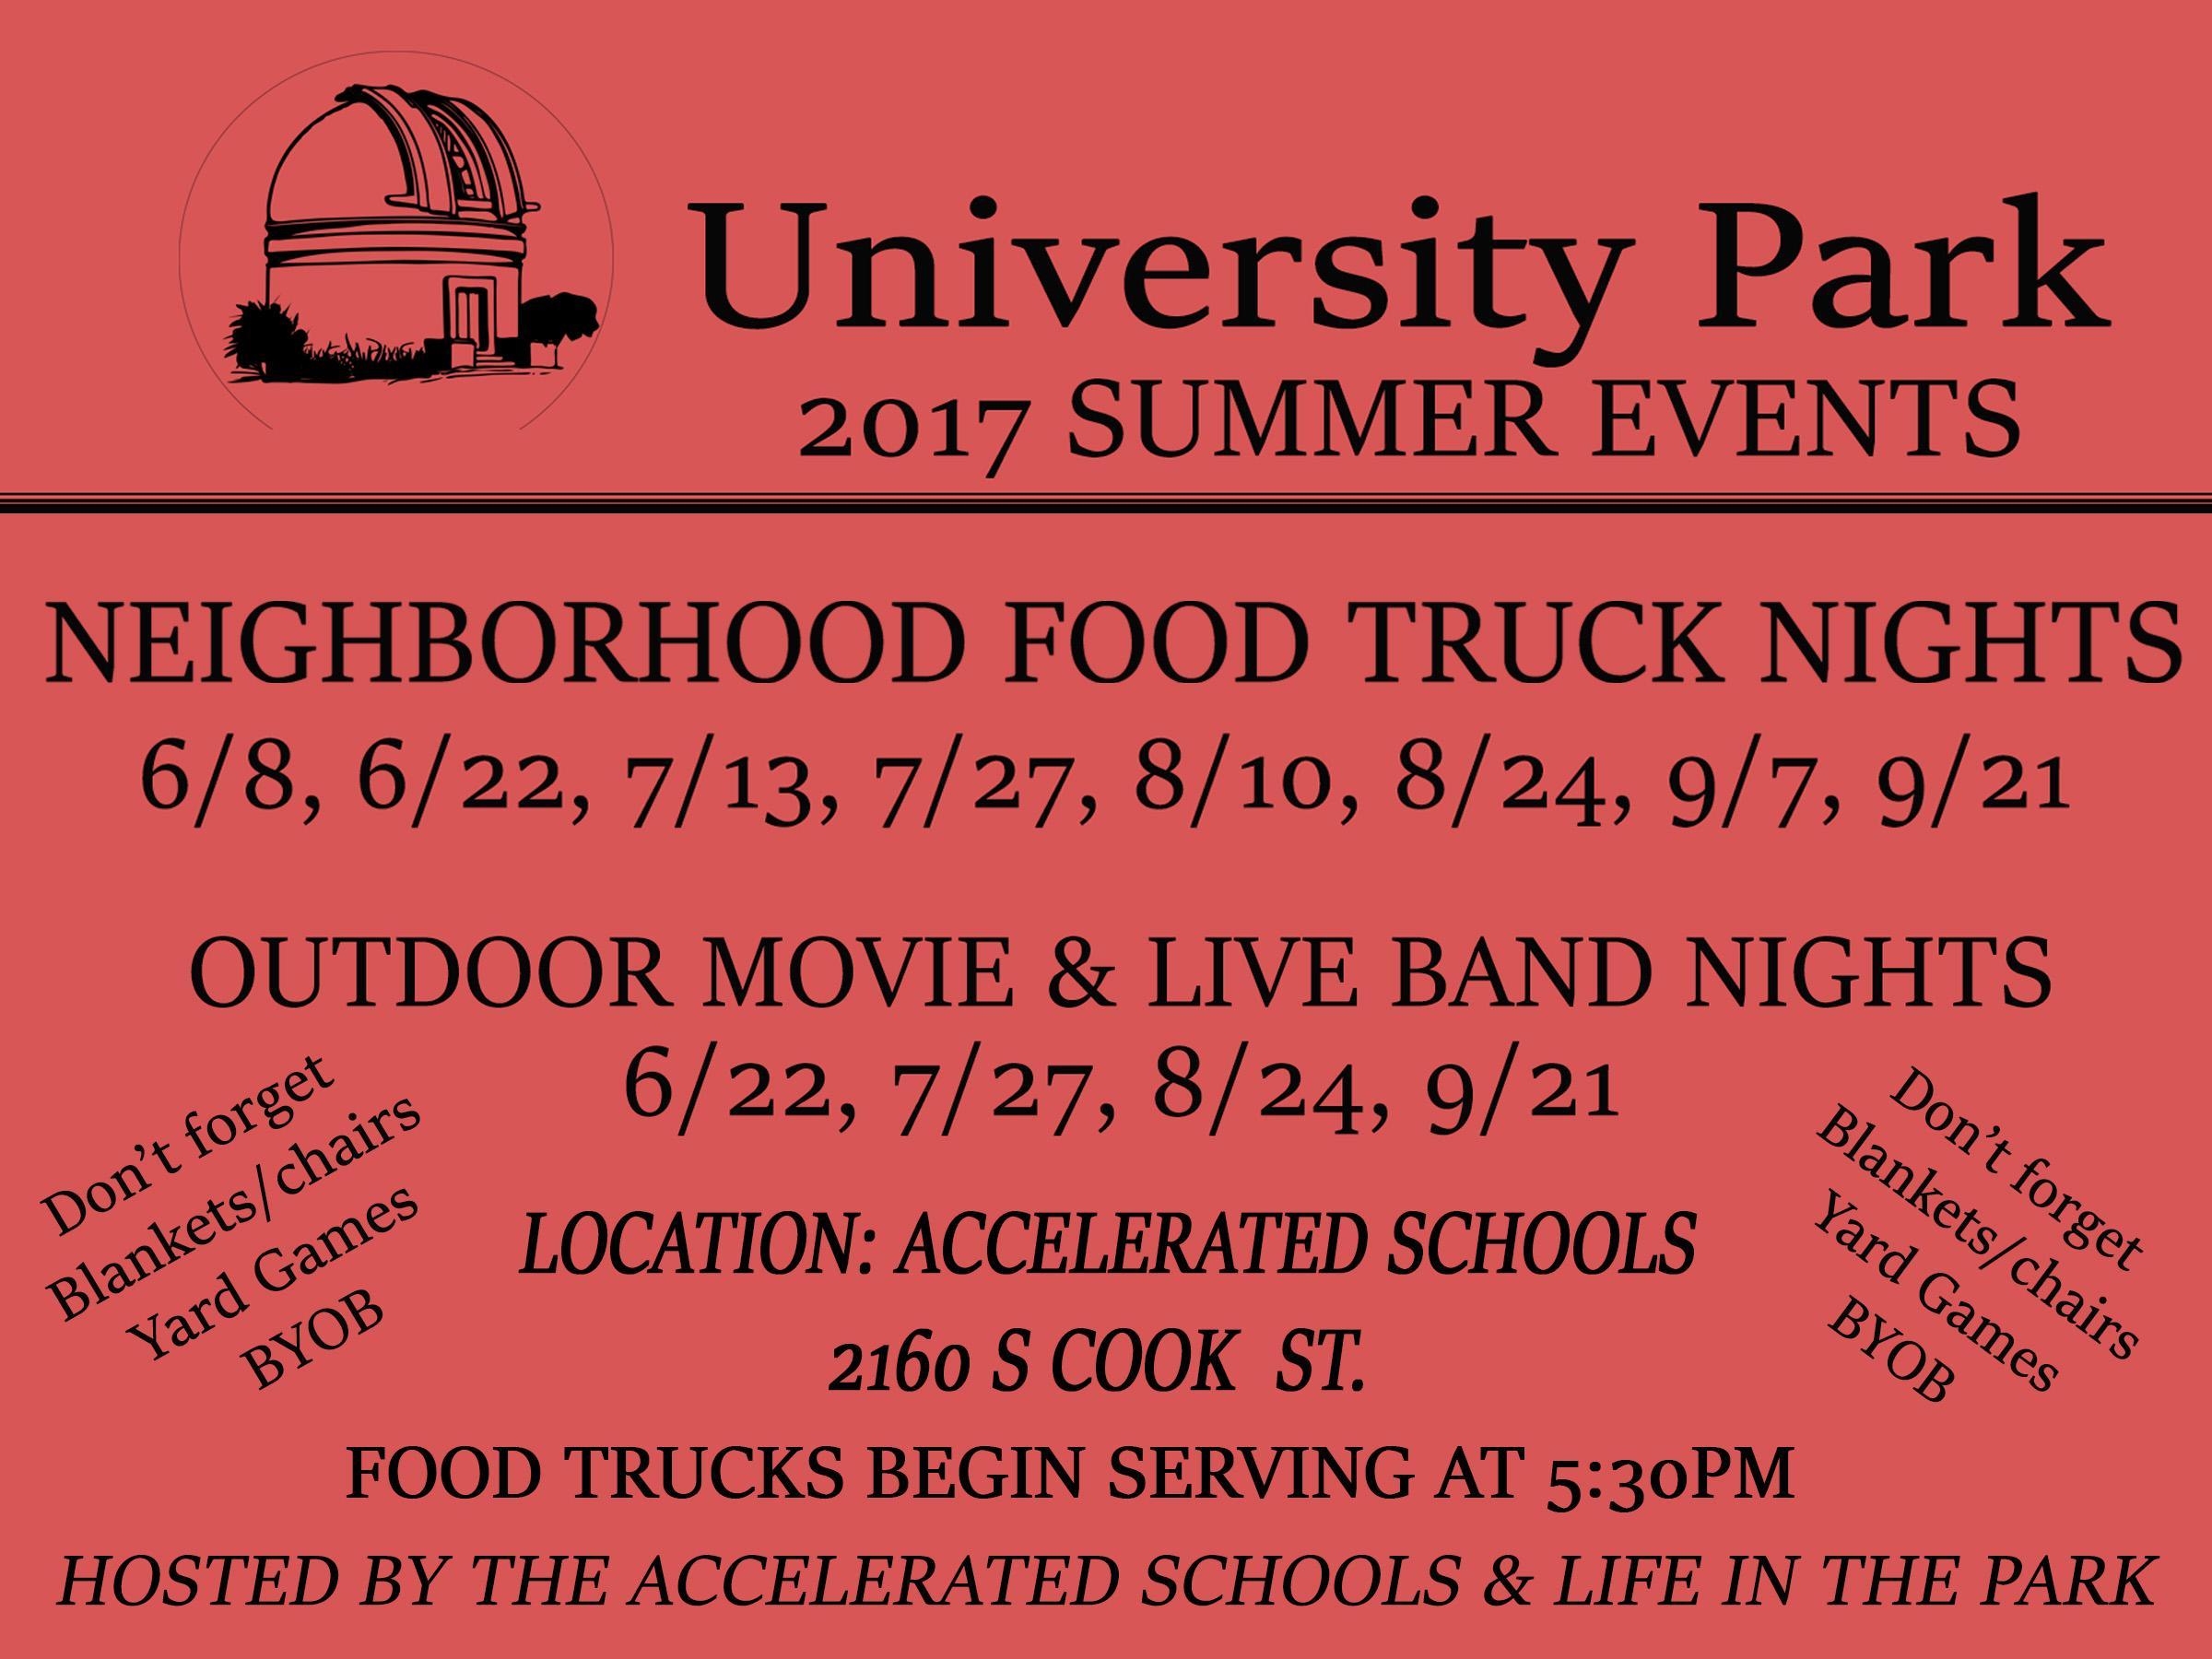 UNIVERSITY PARK NEIGHBORHOOD FOOD TRUCK NIGHTS. UNIVERSITY PARK NEIGHBORHOOD FOOD TRUCK NIGHTS